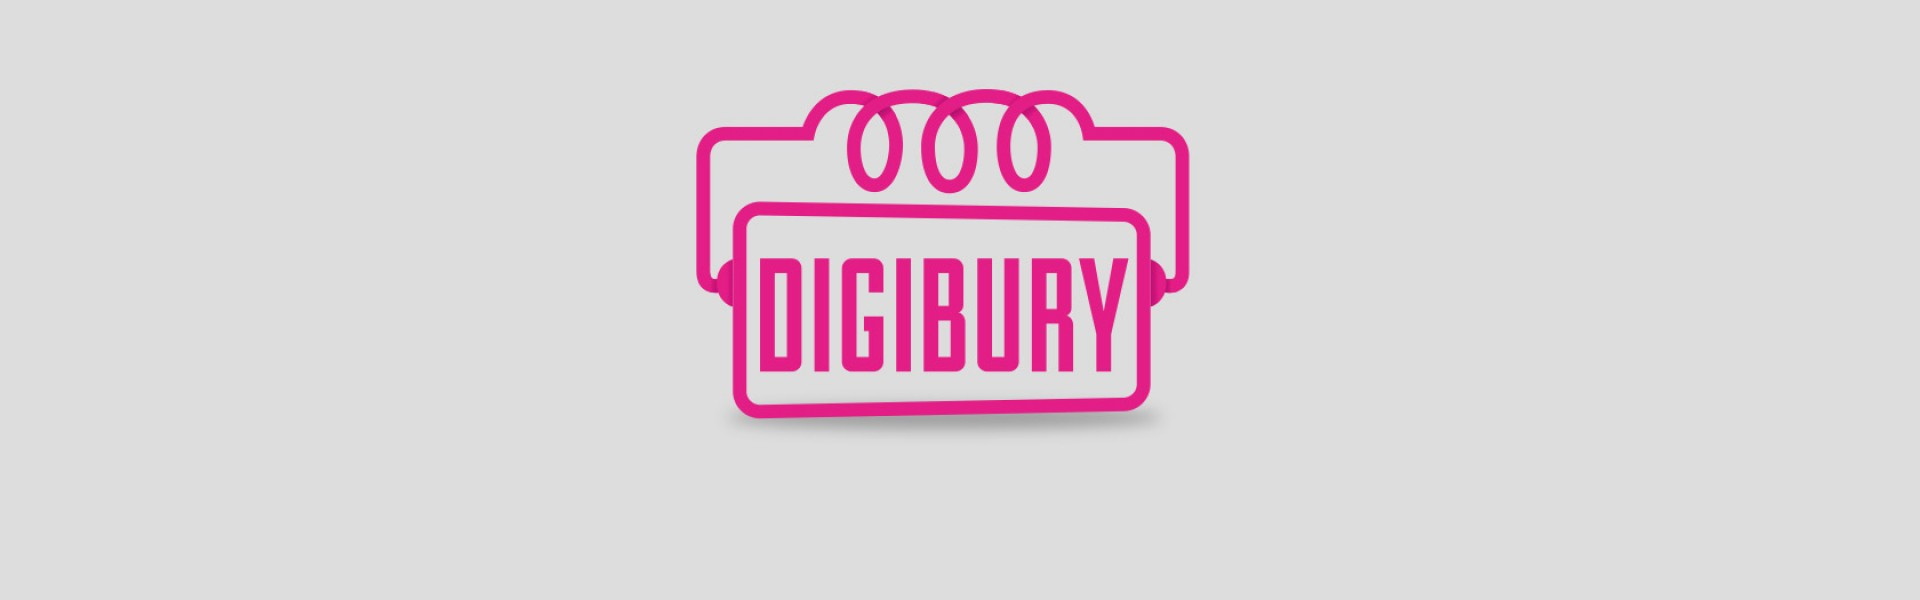 Digibury logo